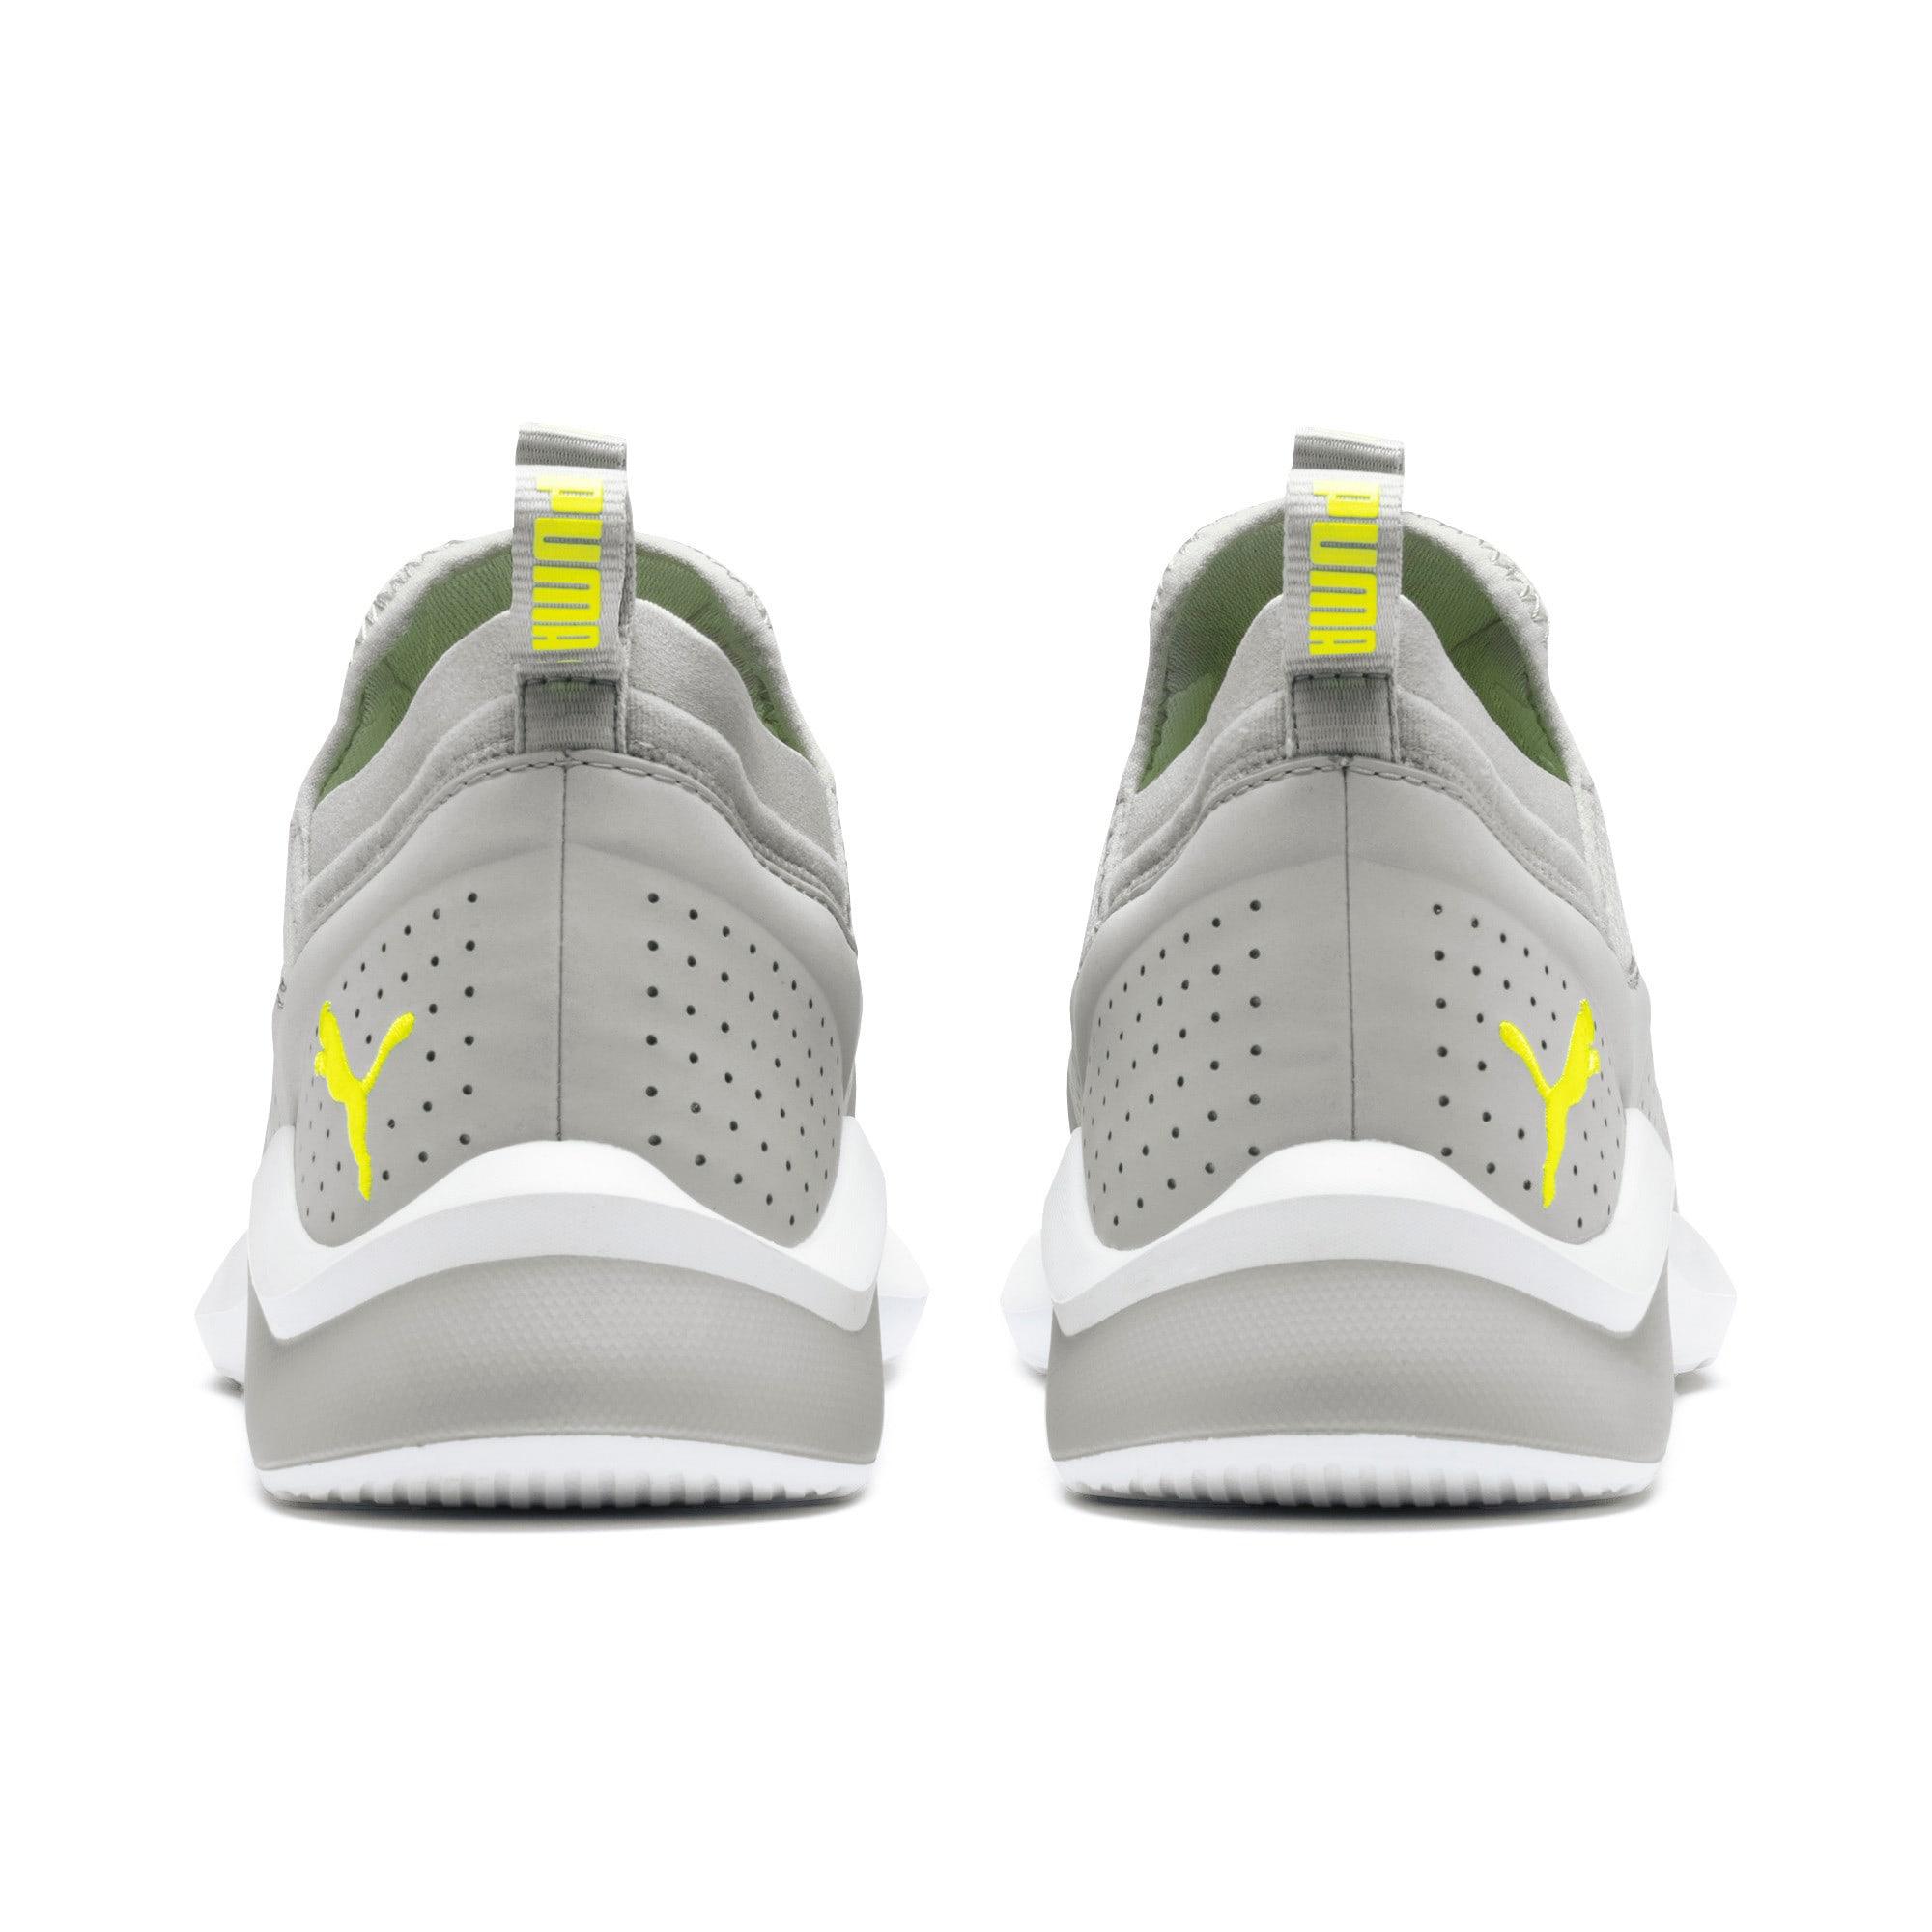 Thumbnail 5 of Emergence Lights Men's Running Shoes, High Rise-Yellow Alert, medium-IND